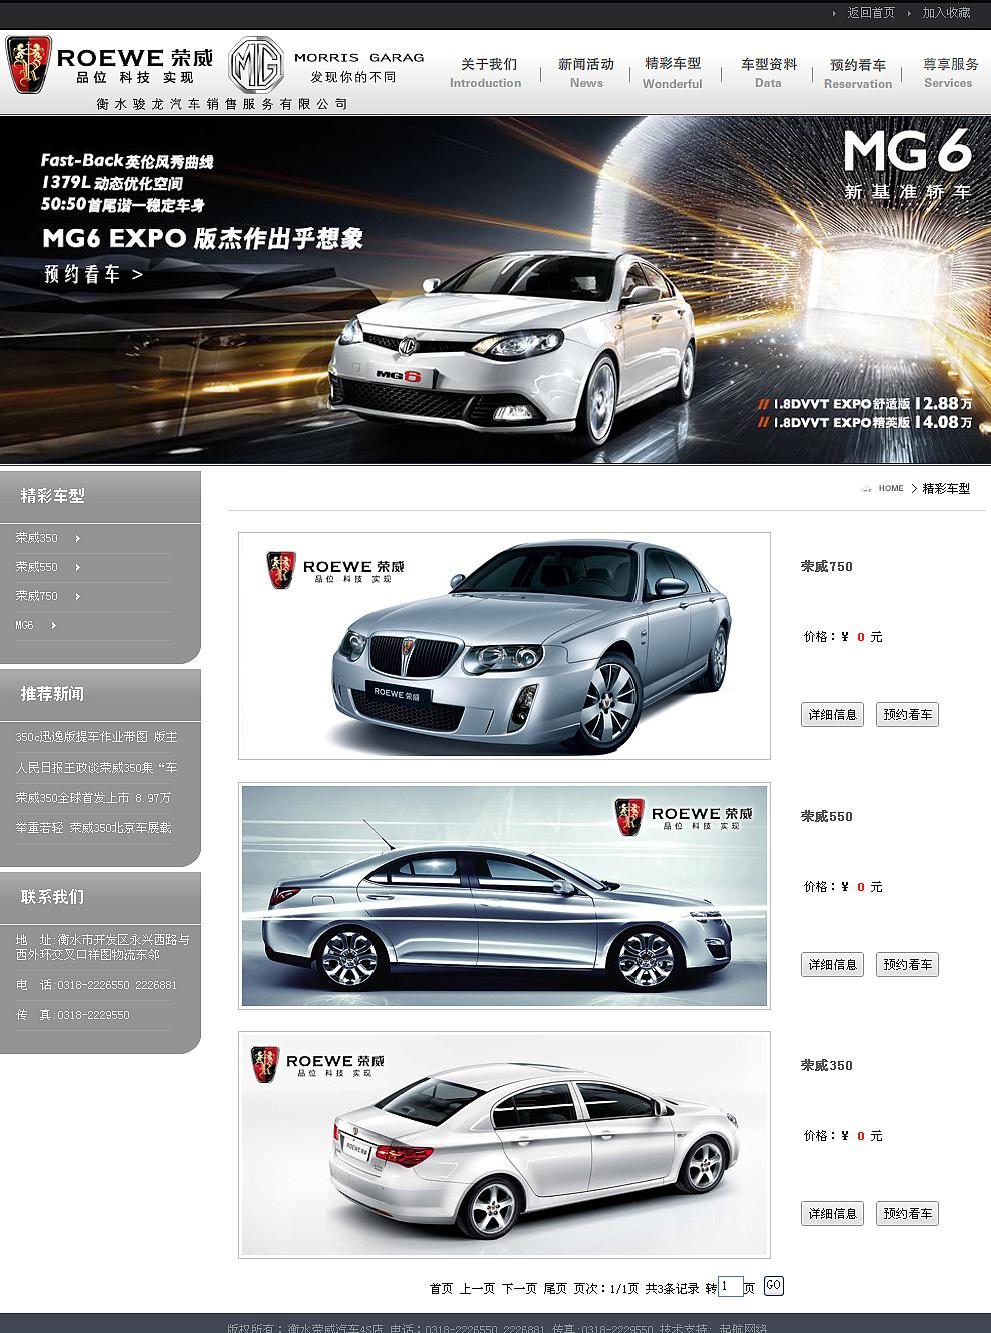 WWW_HS7K_COM_衡水骏龙汽车销售服务有限公司  www.hsroewe.com